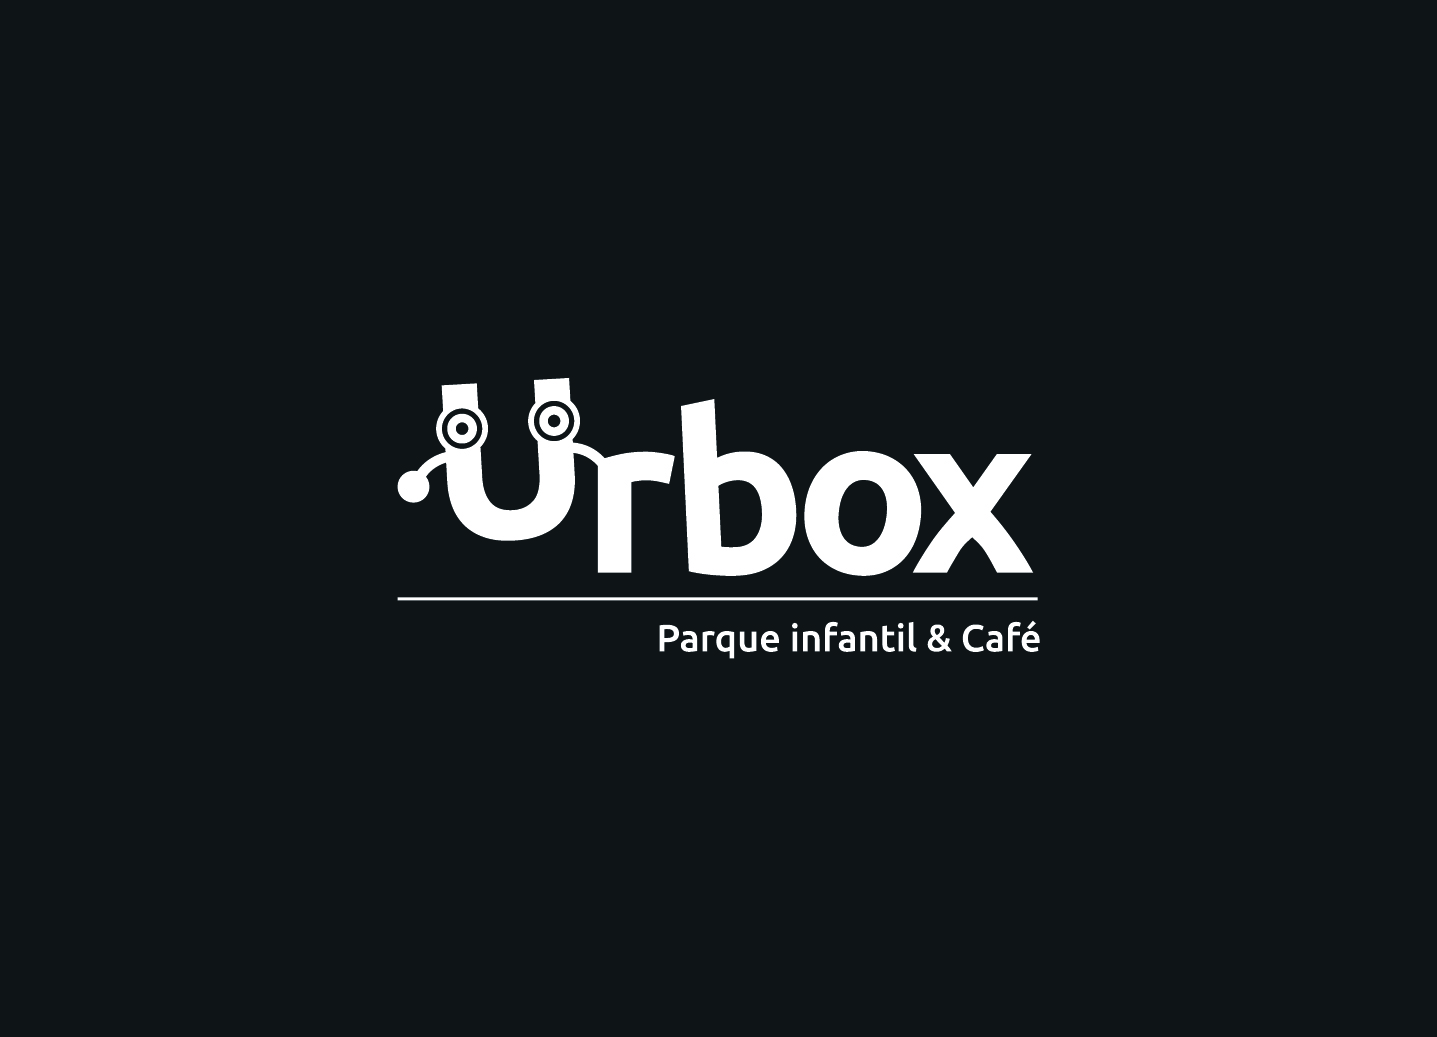 urbox-3